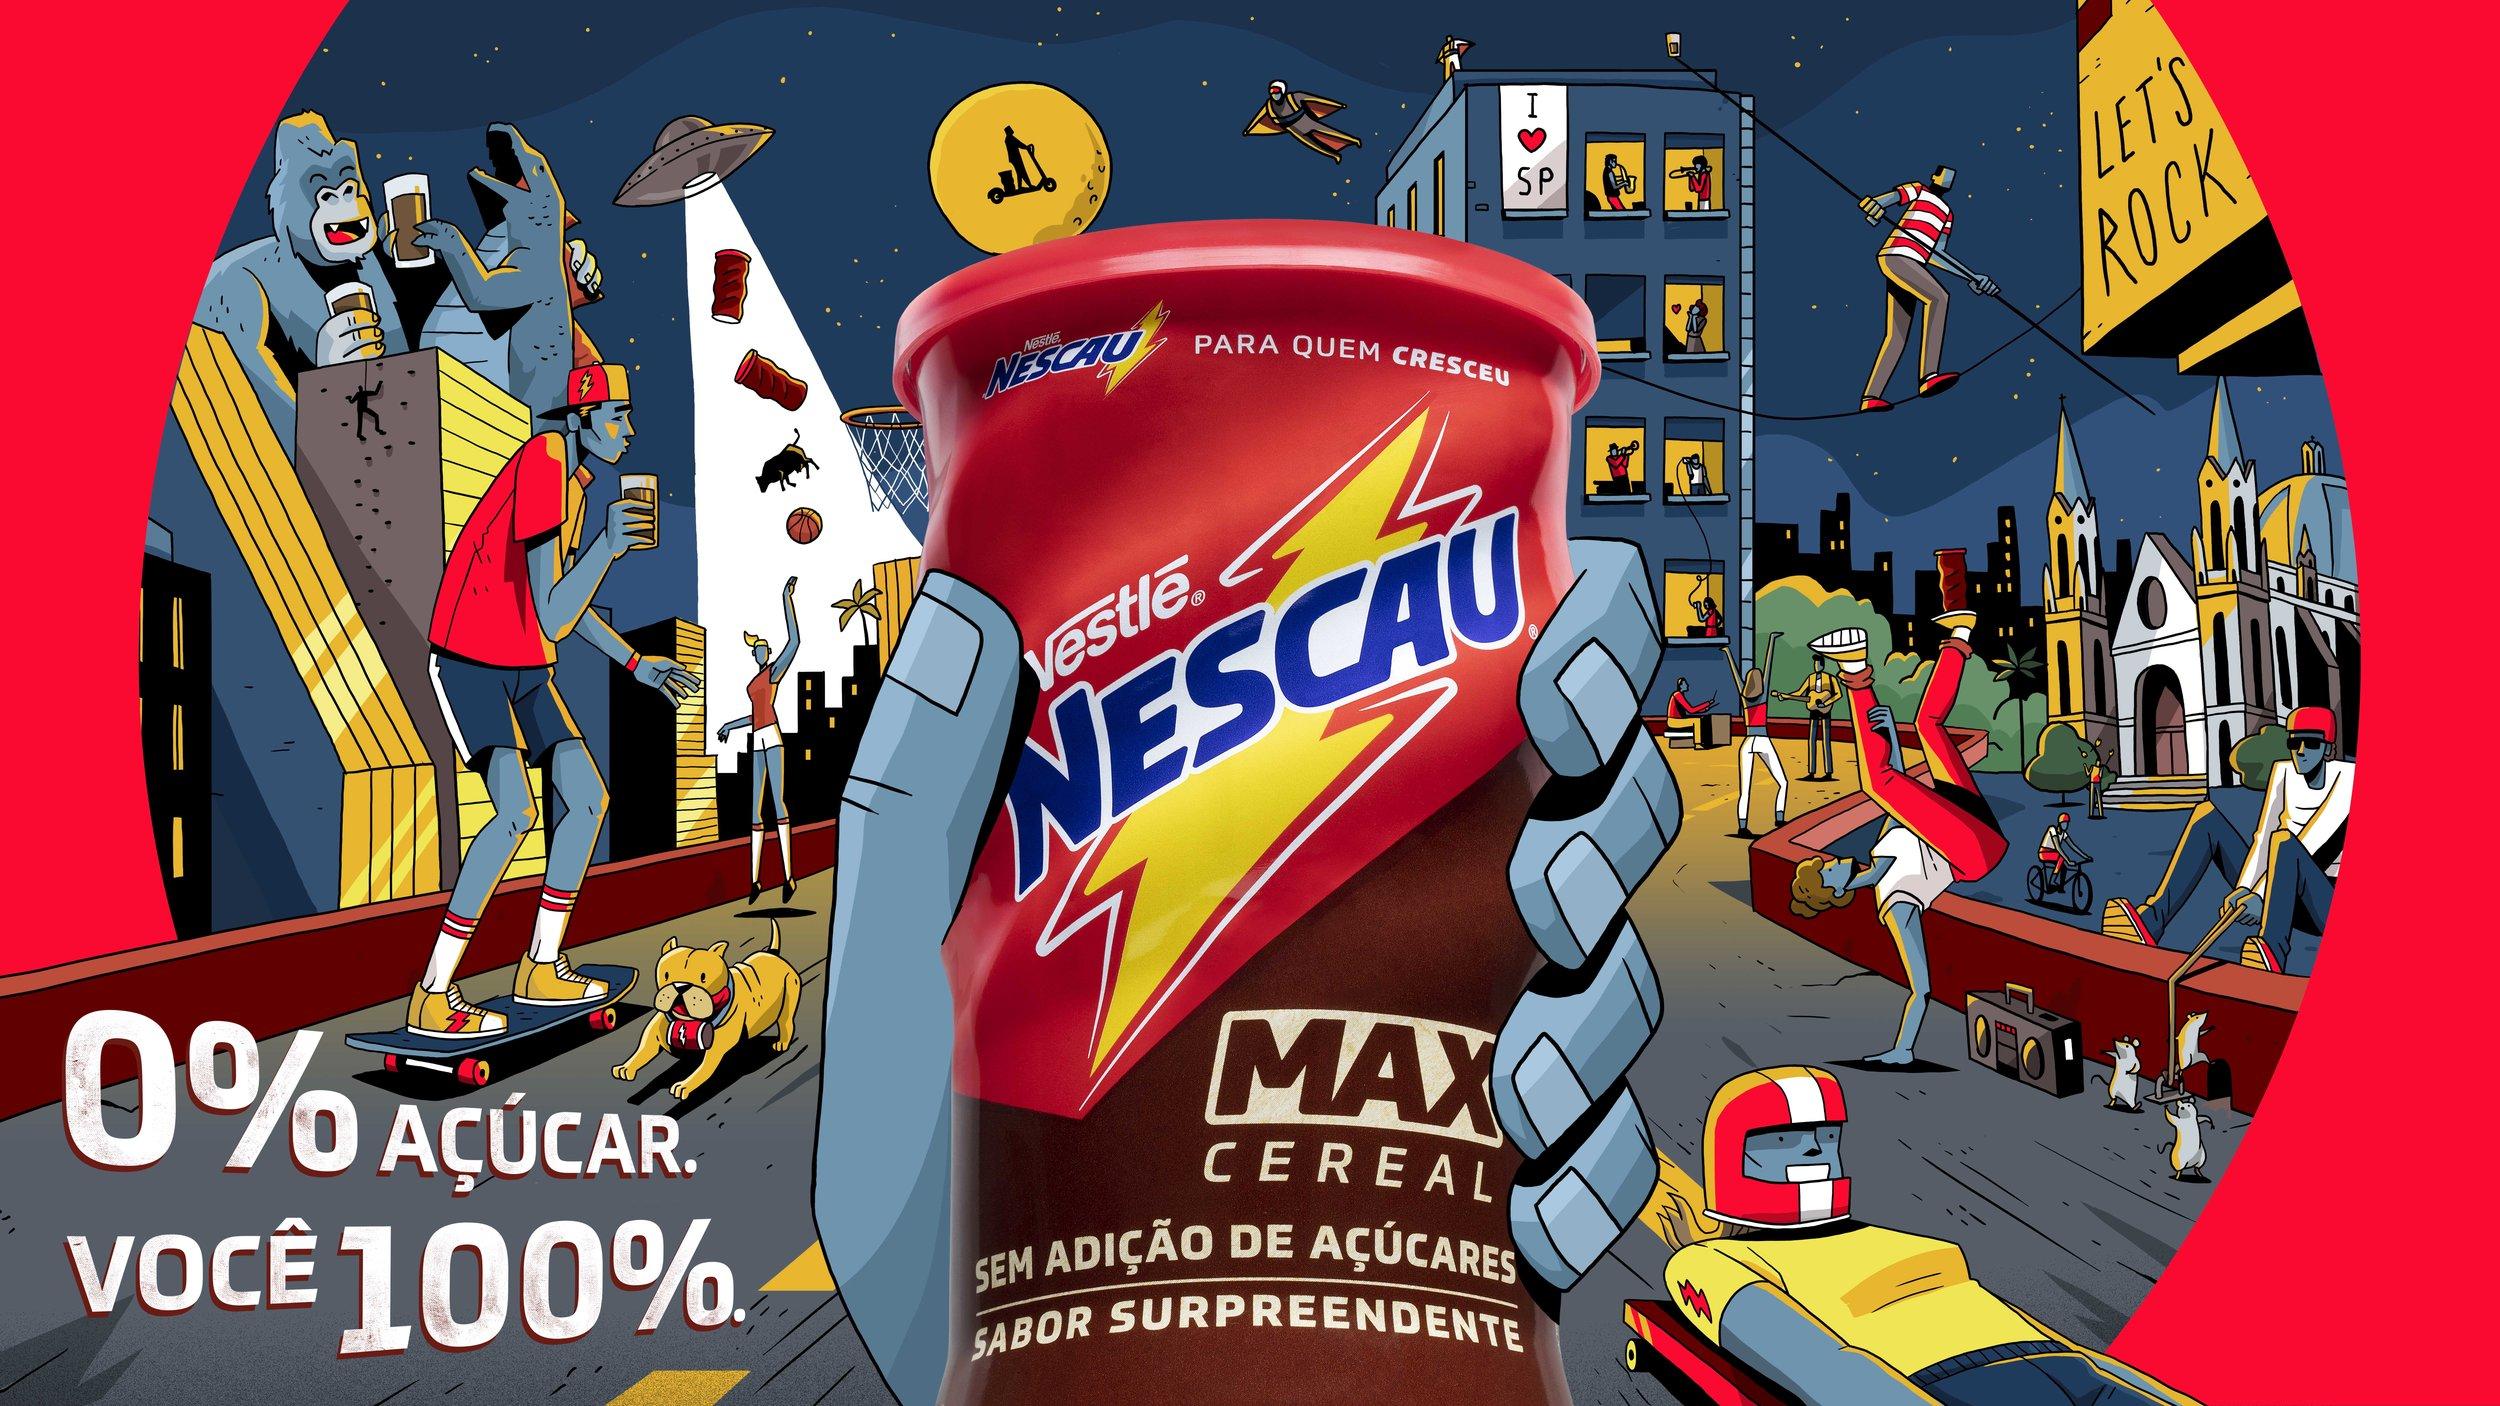 NESCAU_MAX_SP.jpg